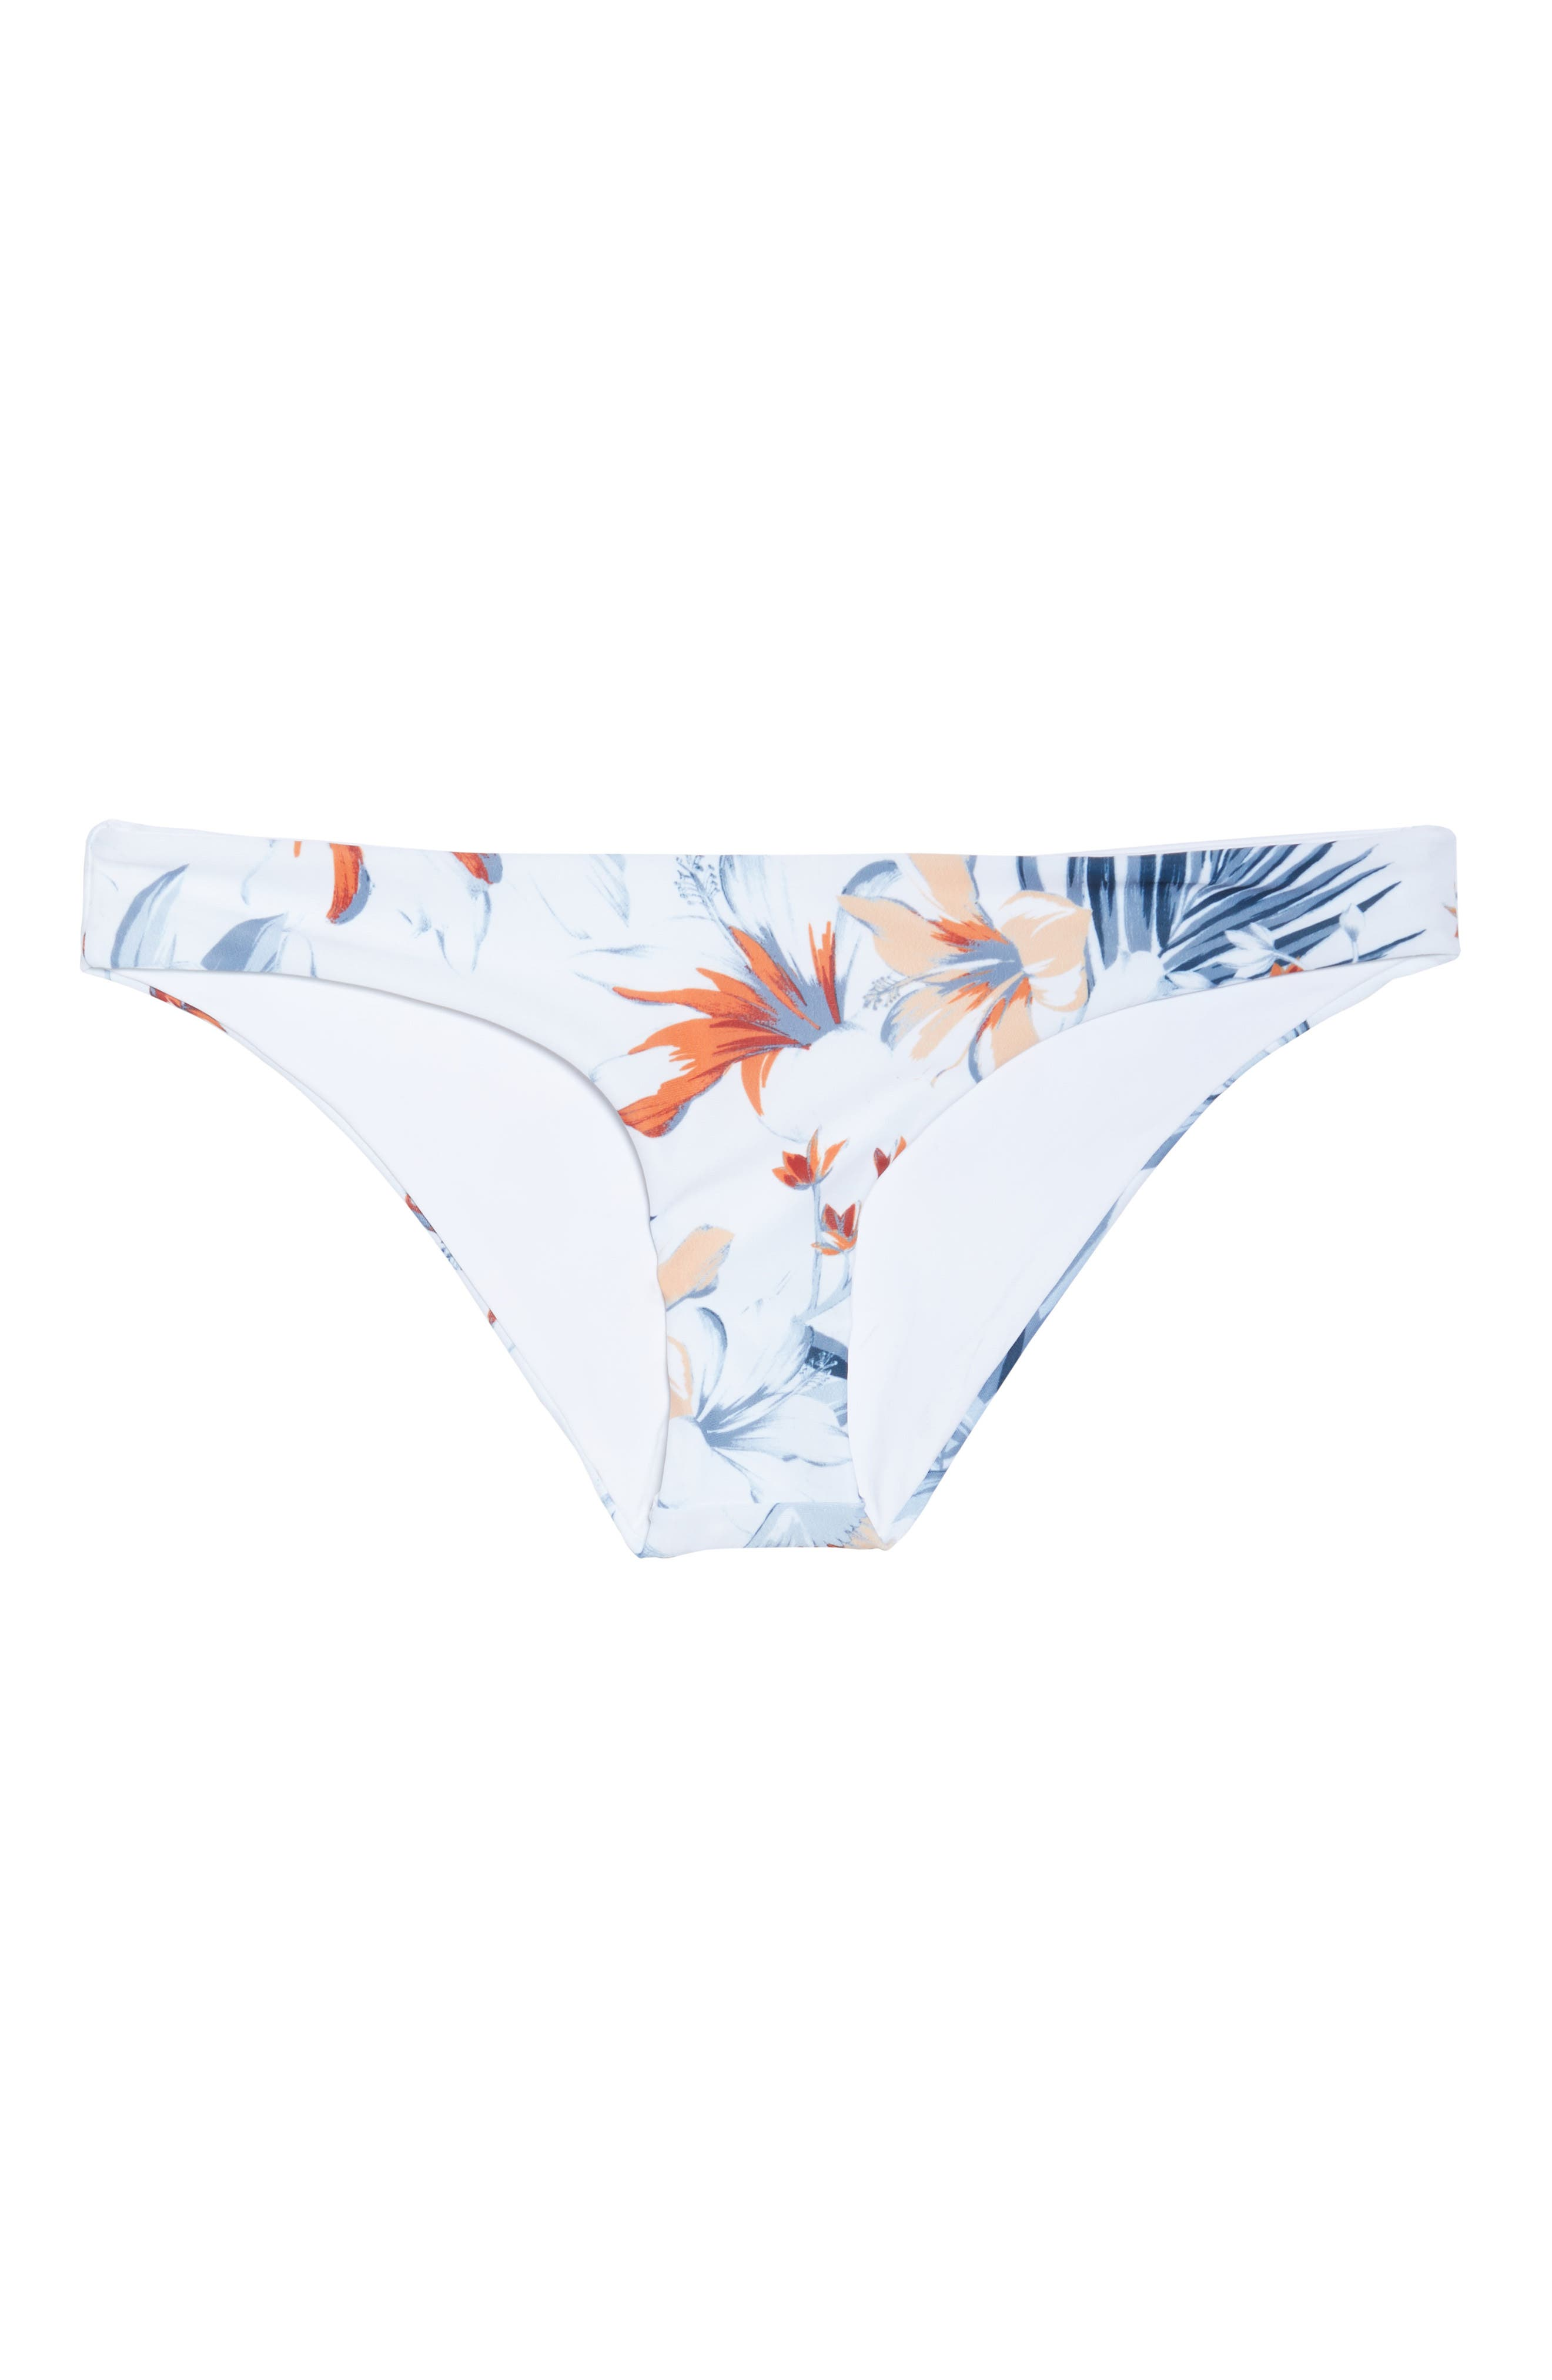 Sandy Classic Bikini Bottoms,                             Alternate thumbnail 6, color,                             BIRD OF PARADISE